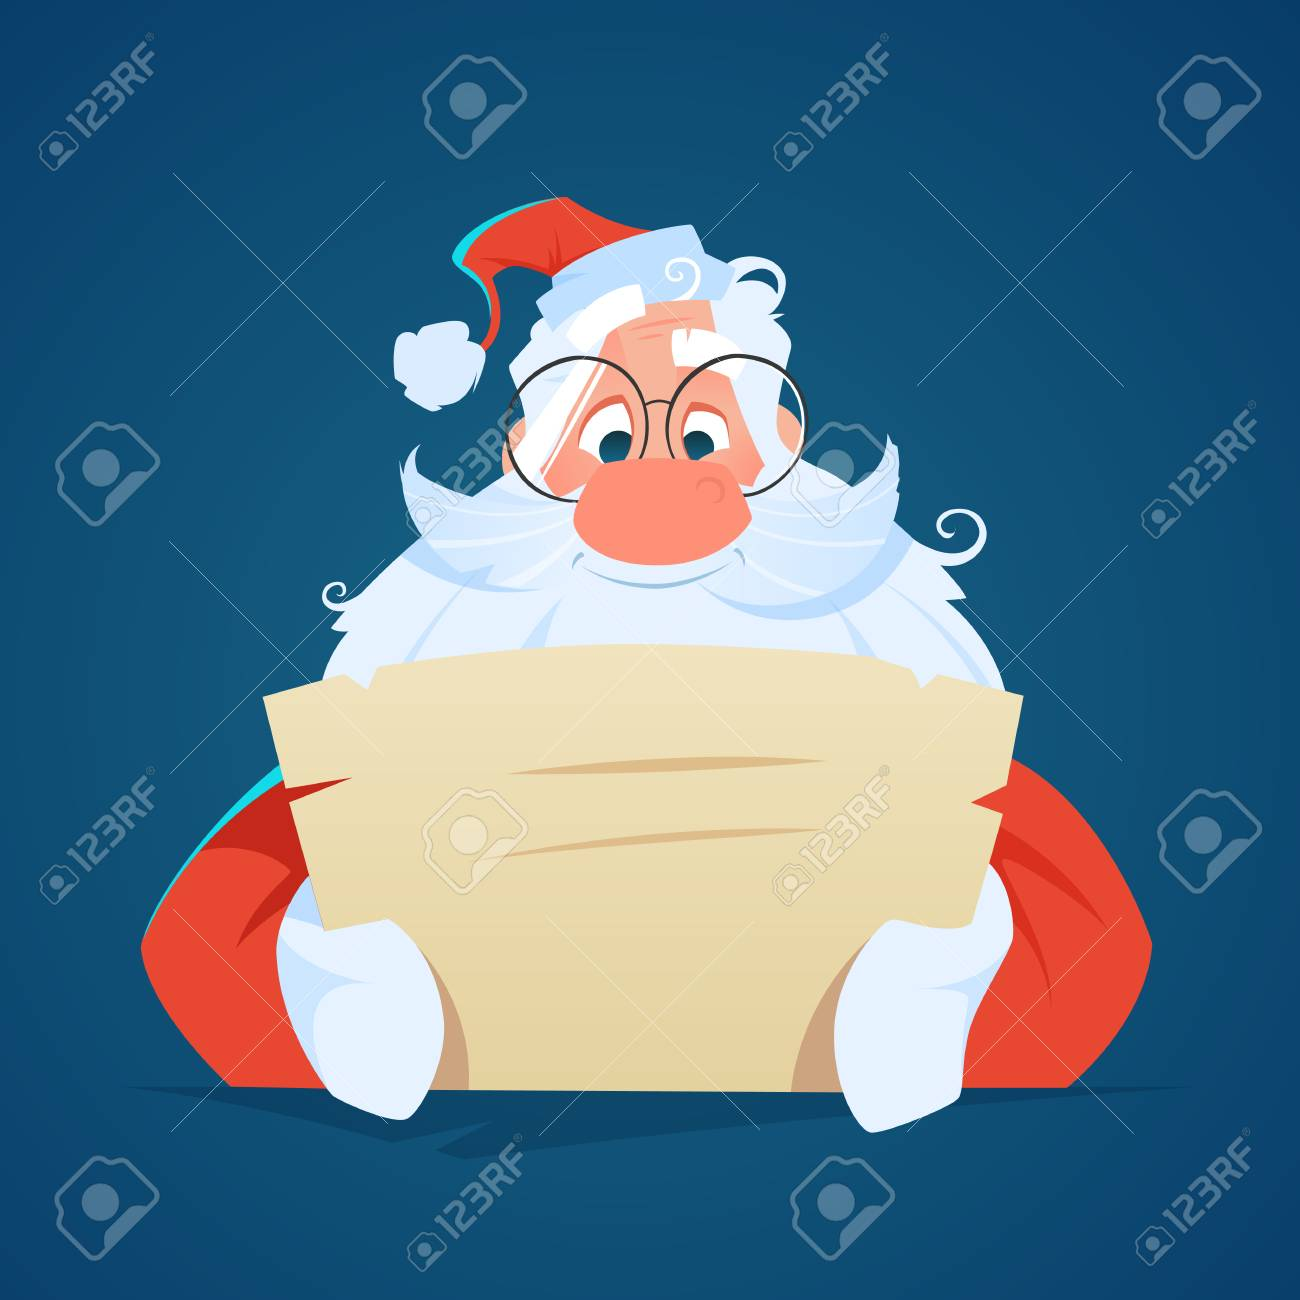 Happy smile santa claus reading a letter - 87974548